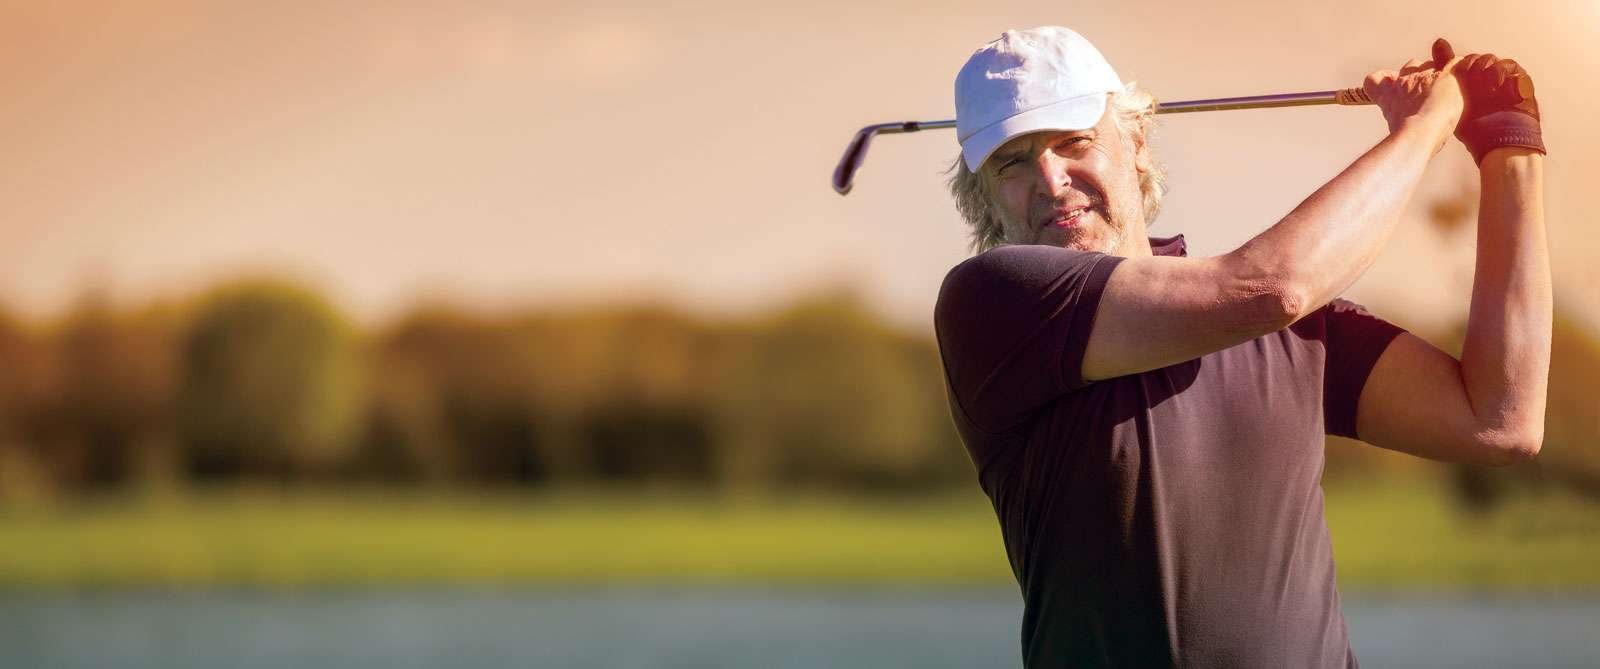 bigstock-Male-senior-golf-player-swingi-90763502